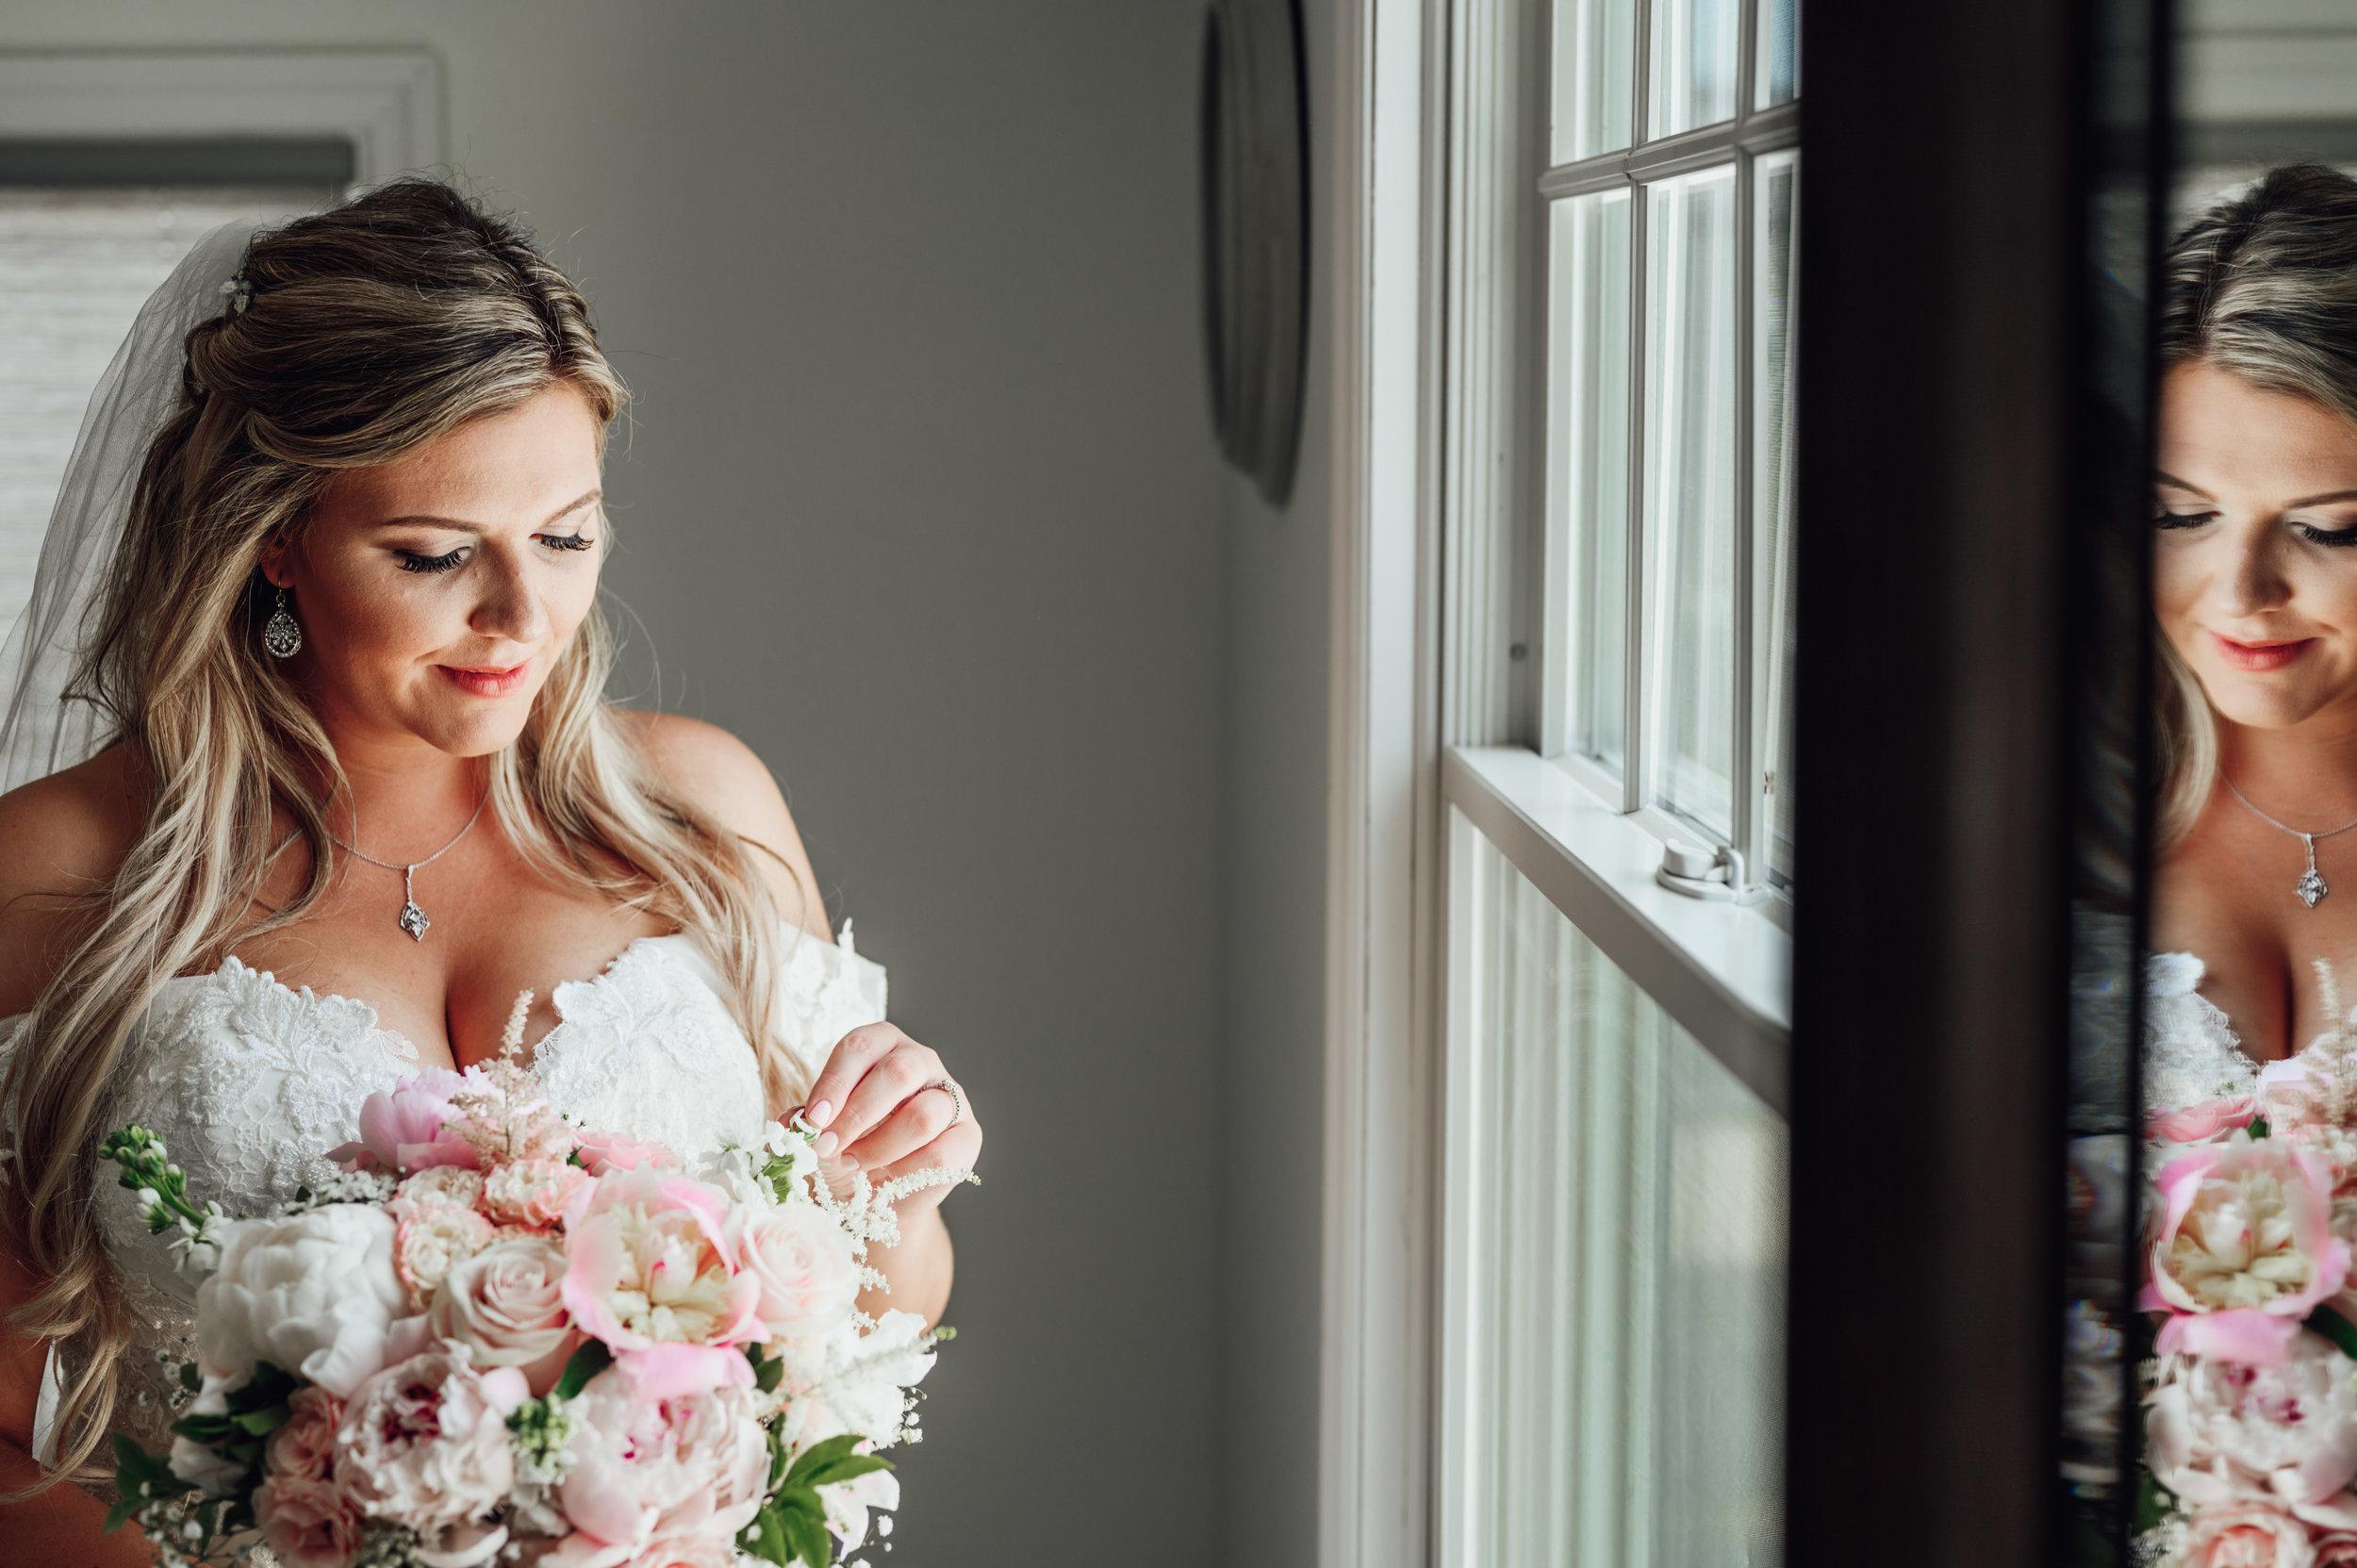 New Jersey Wedding Photographer, Felsberg Photography LBI wedding photography 34.jpg